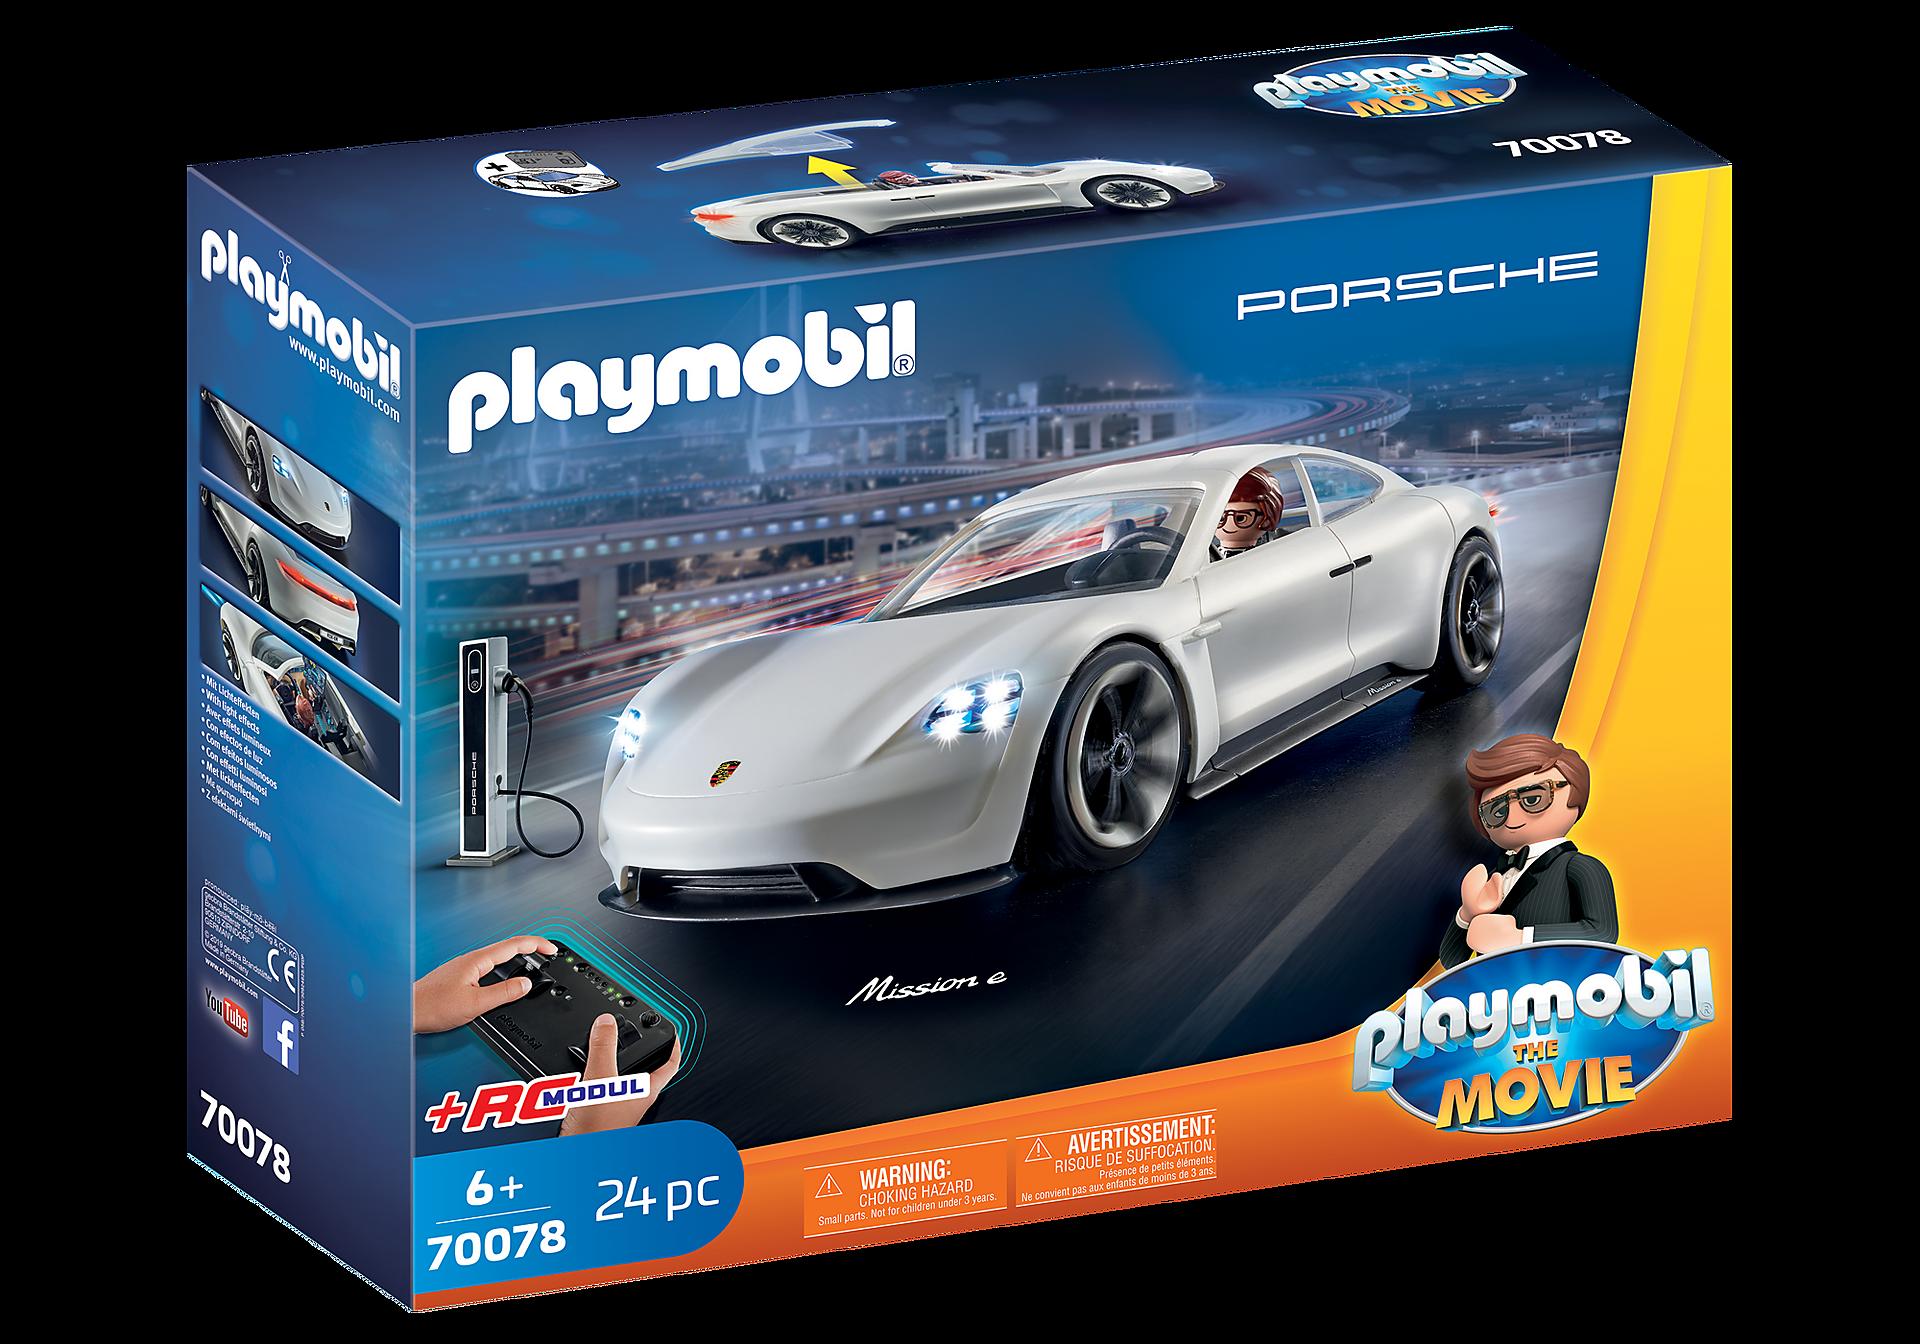 70078 PLAYMOBIL: THE MOVIE Ο Ρεξ Ντάσερ με την Porsche Mission E zoom image2